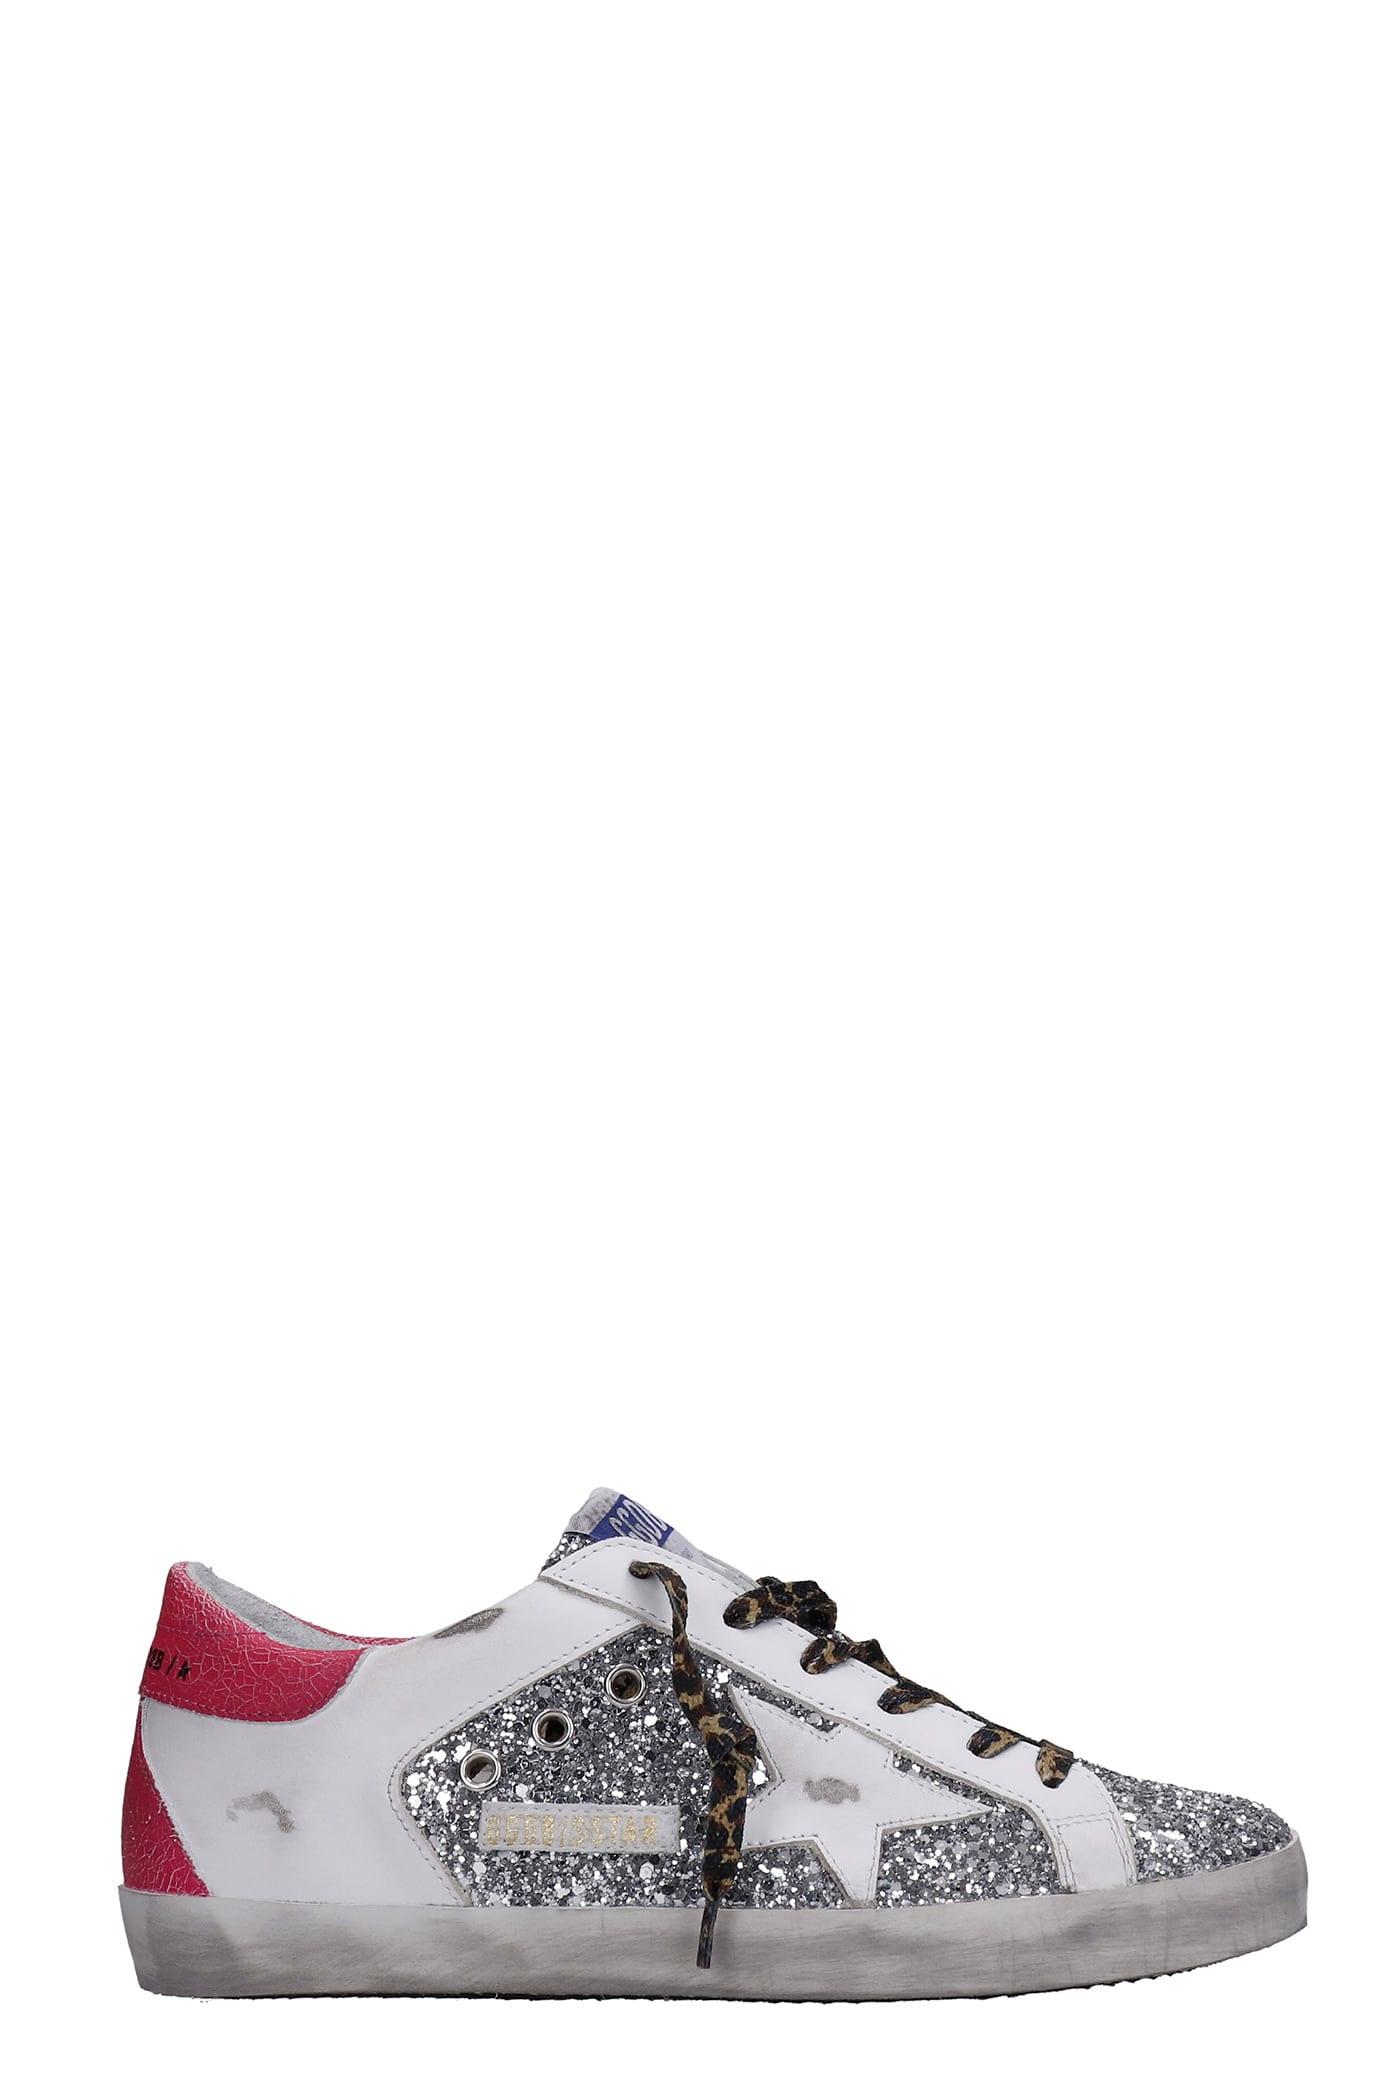 Golden Goose Superstar Sneakers In Silver Glitter